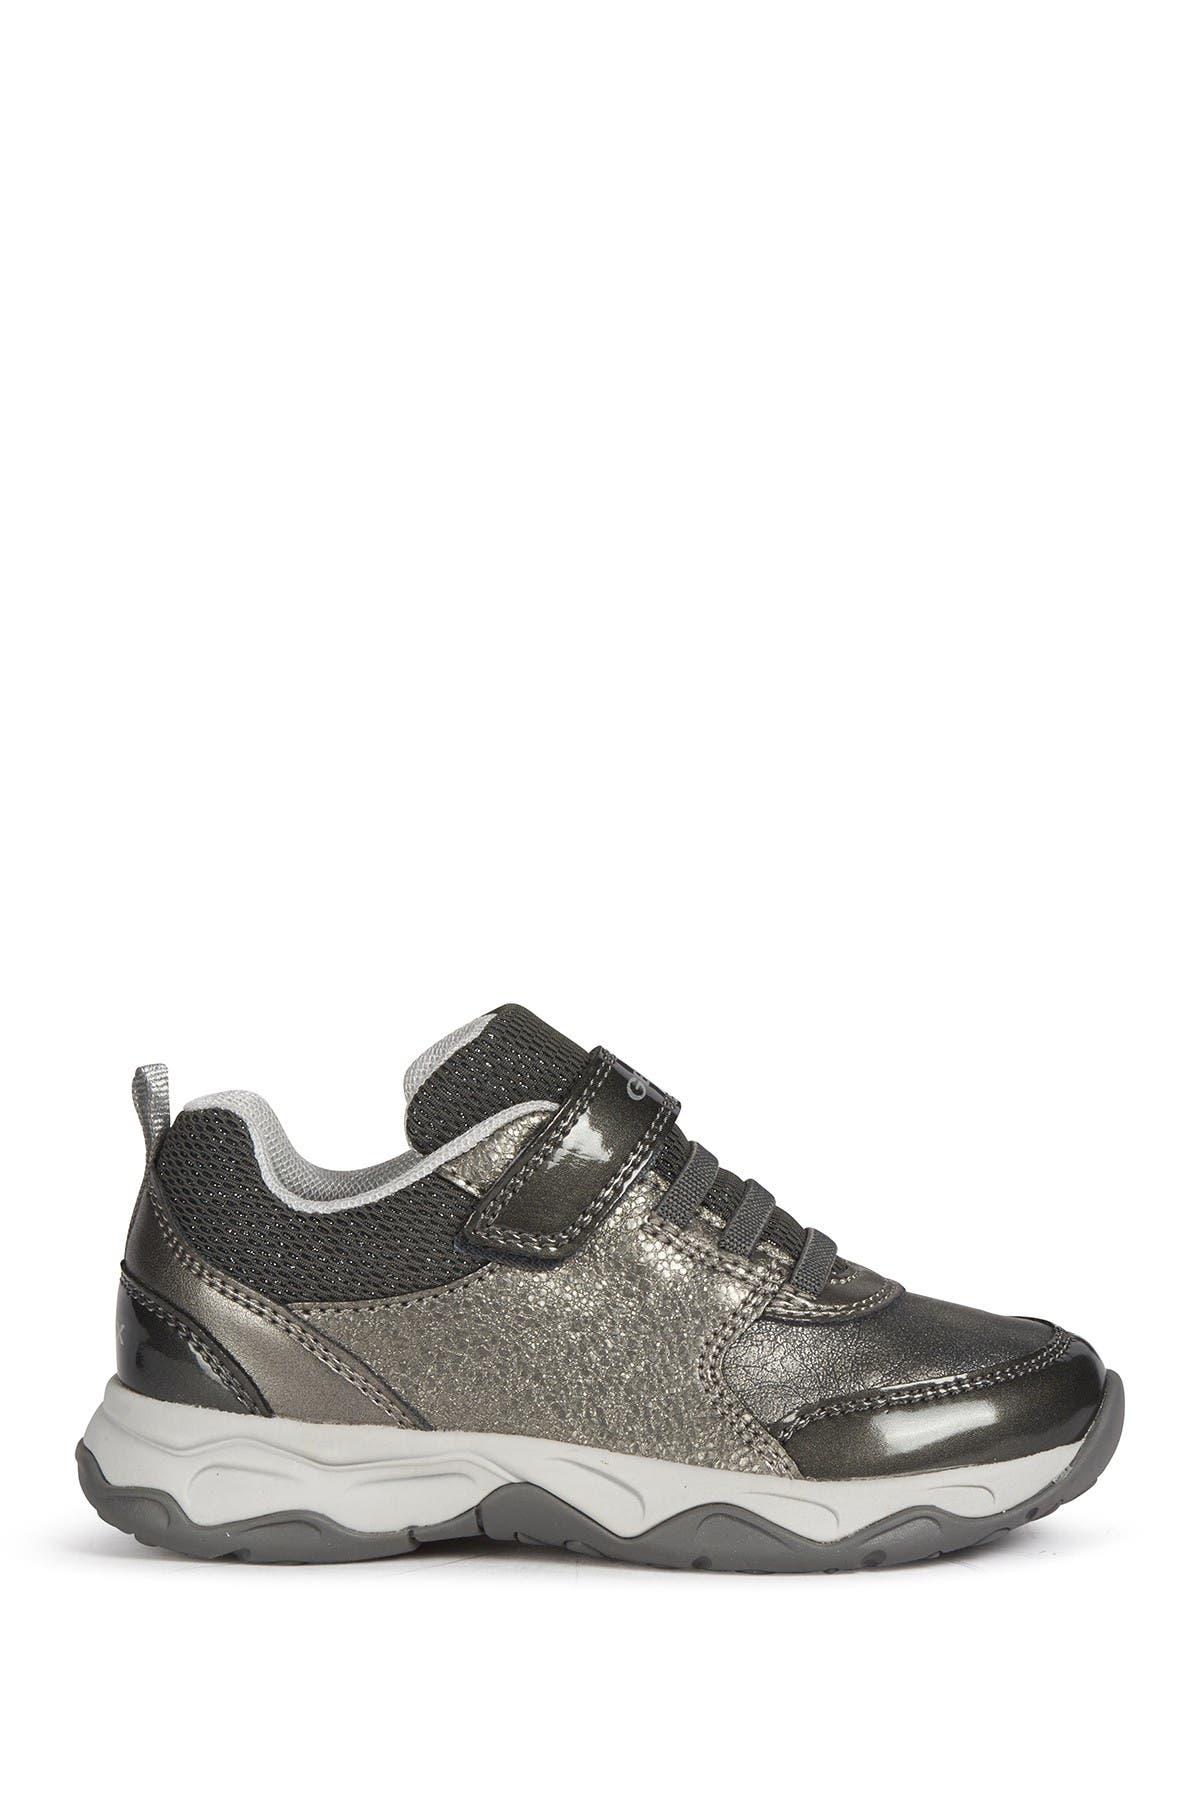 GEOX Calco Glitter Sneaker